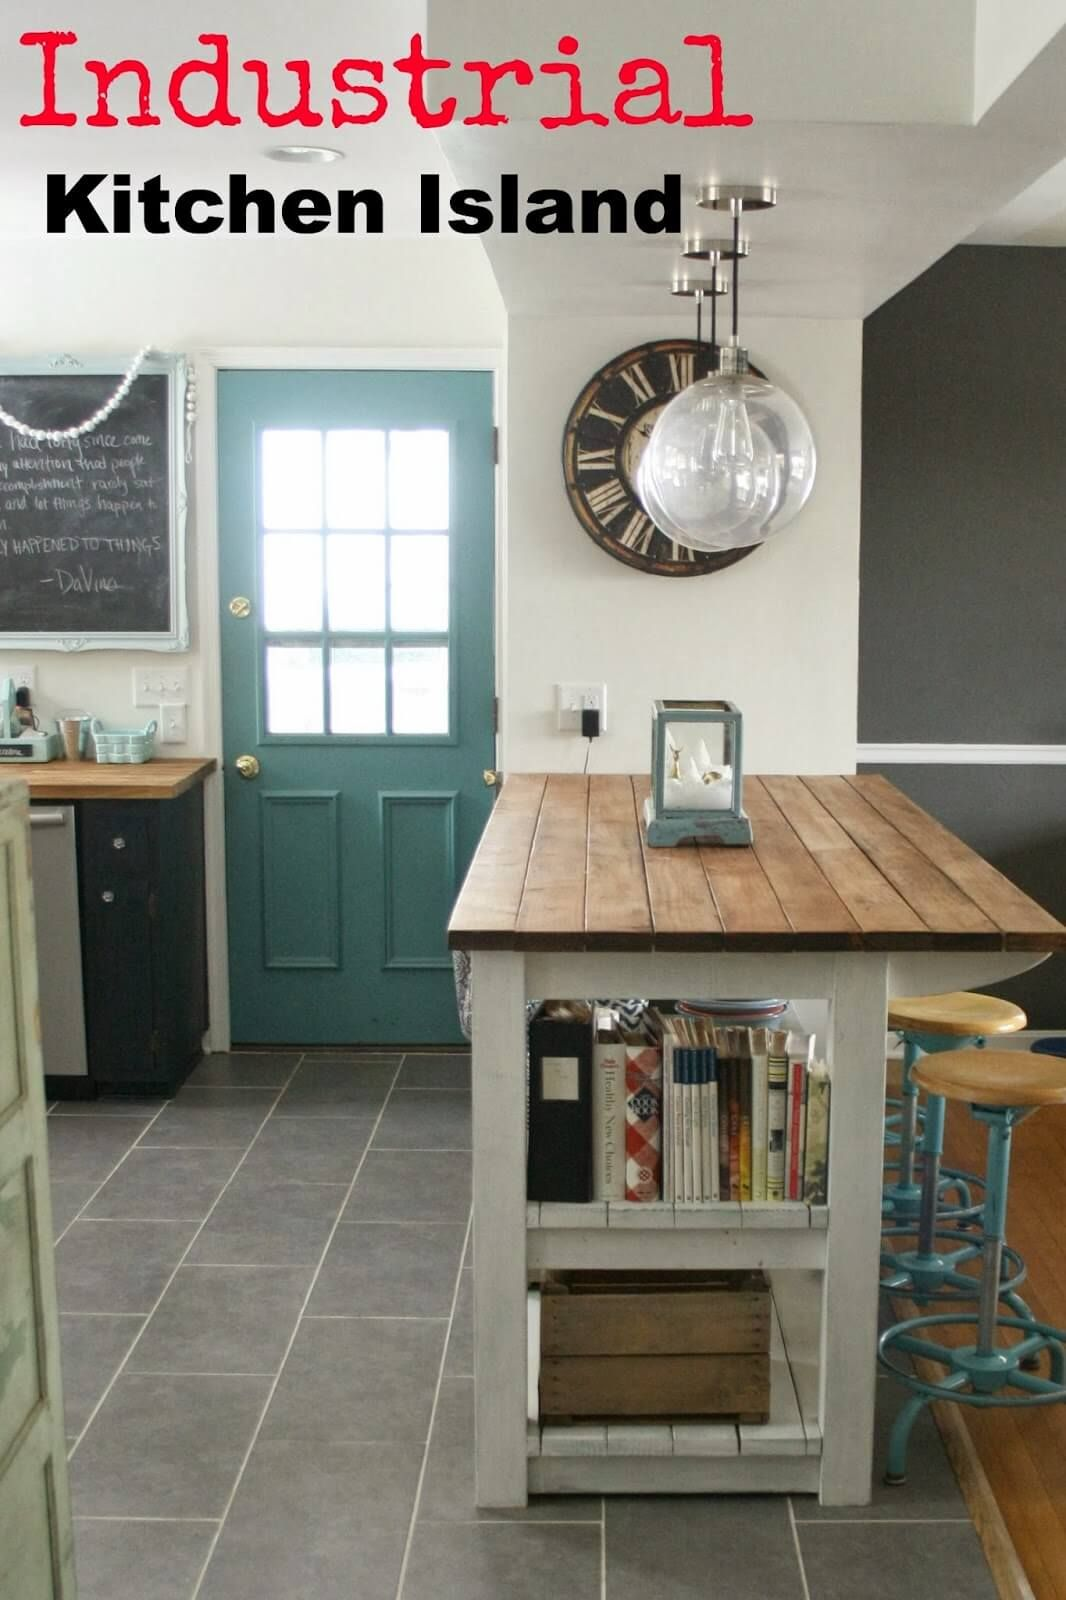 Isola Cucina Fai Da Te.Big Kitchen Islands Can Double As Breakfast Bars Diy Furniture Nel